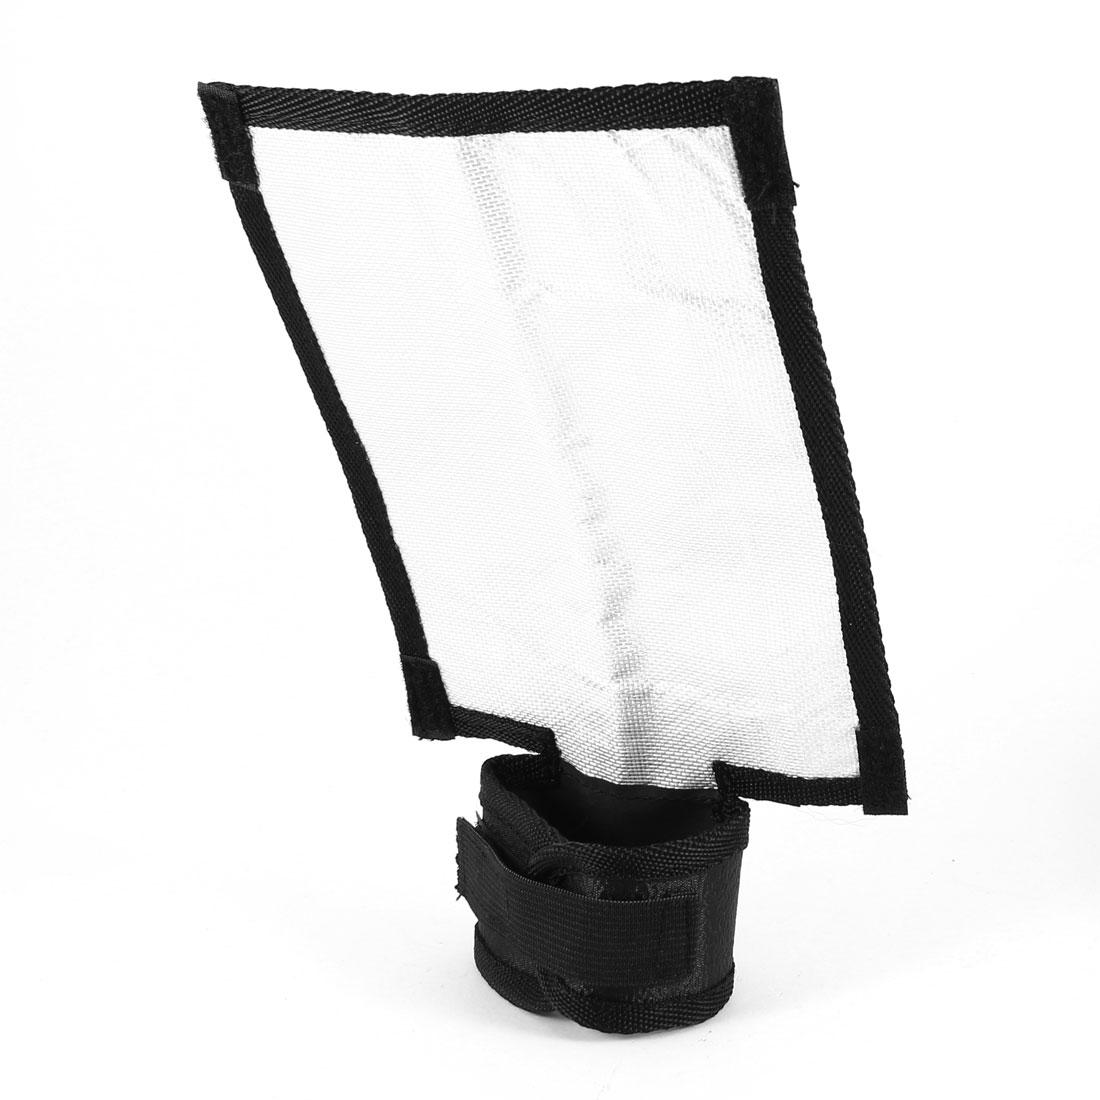 Portable 17cmx11.5cm Rectangle Flash Light Diffuser Softbox for DSLR SLR Camera